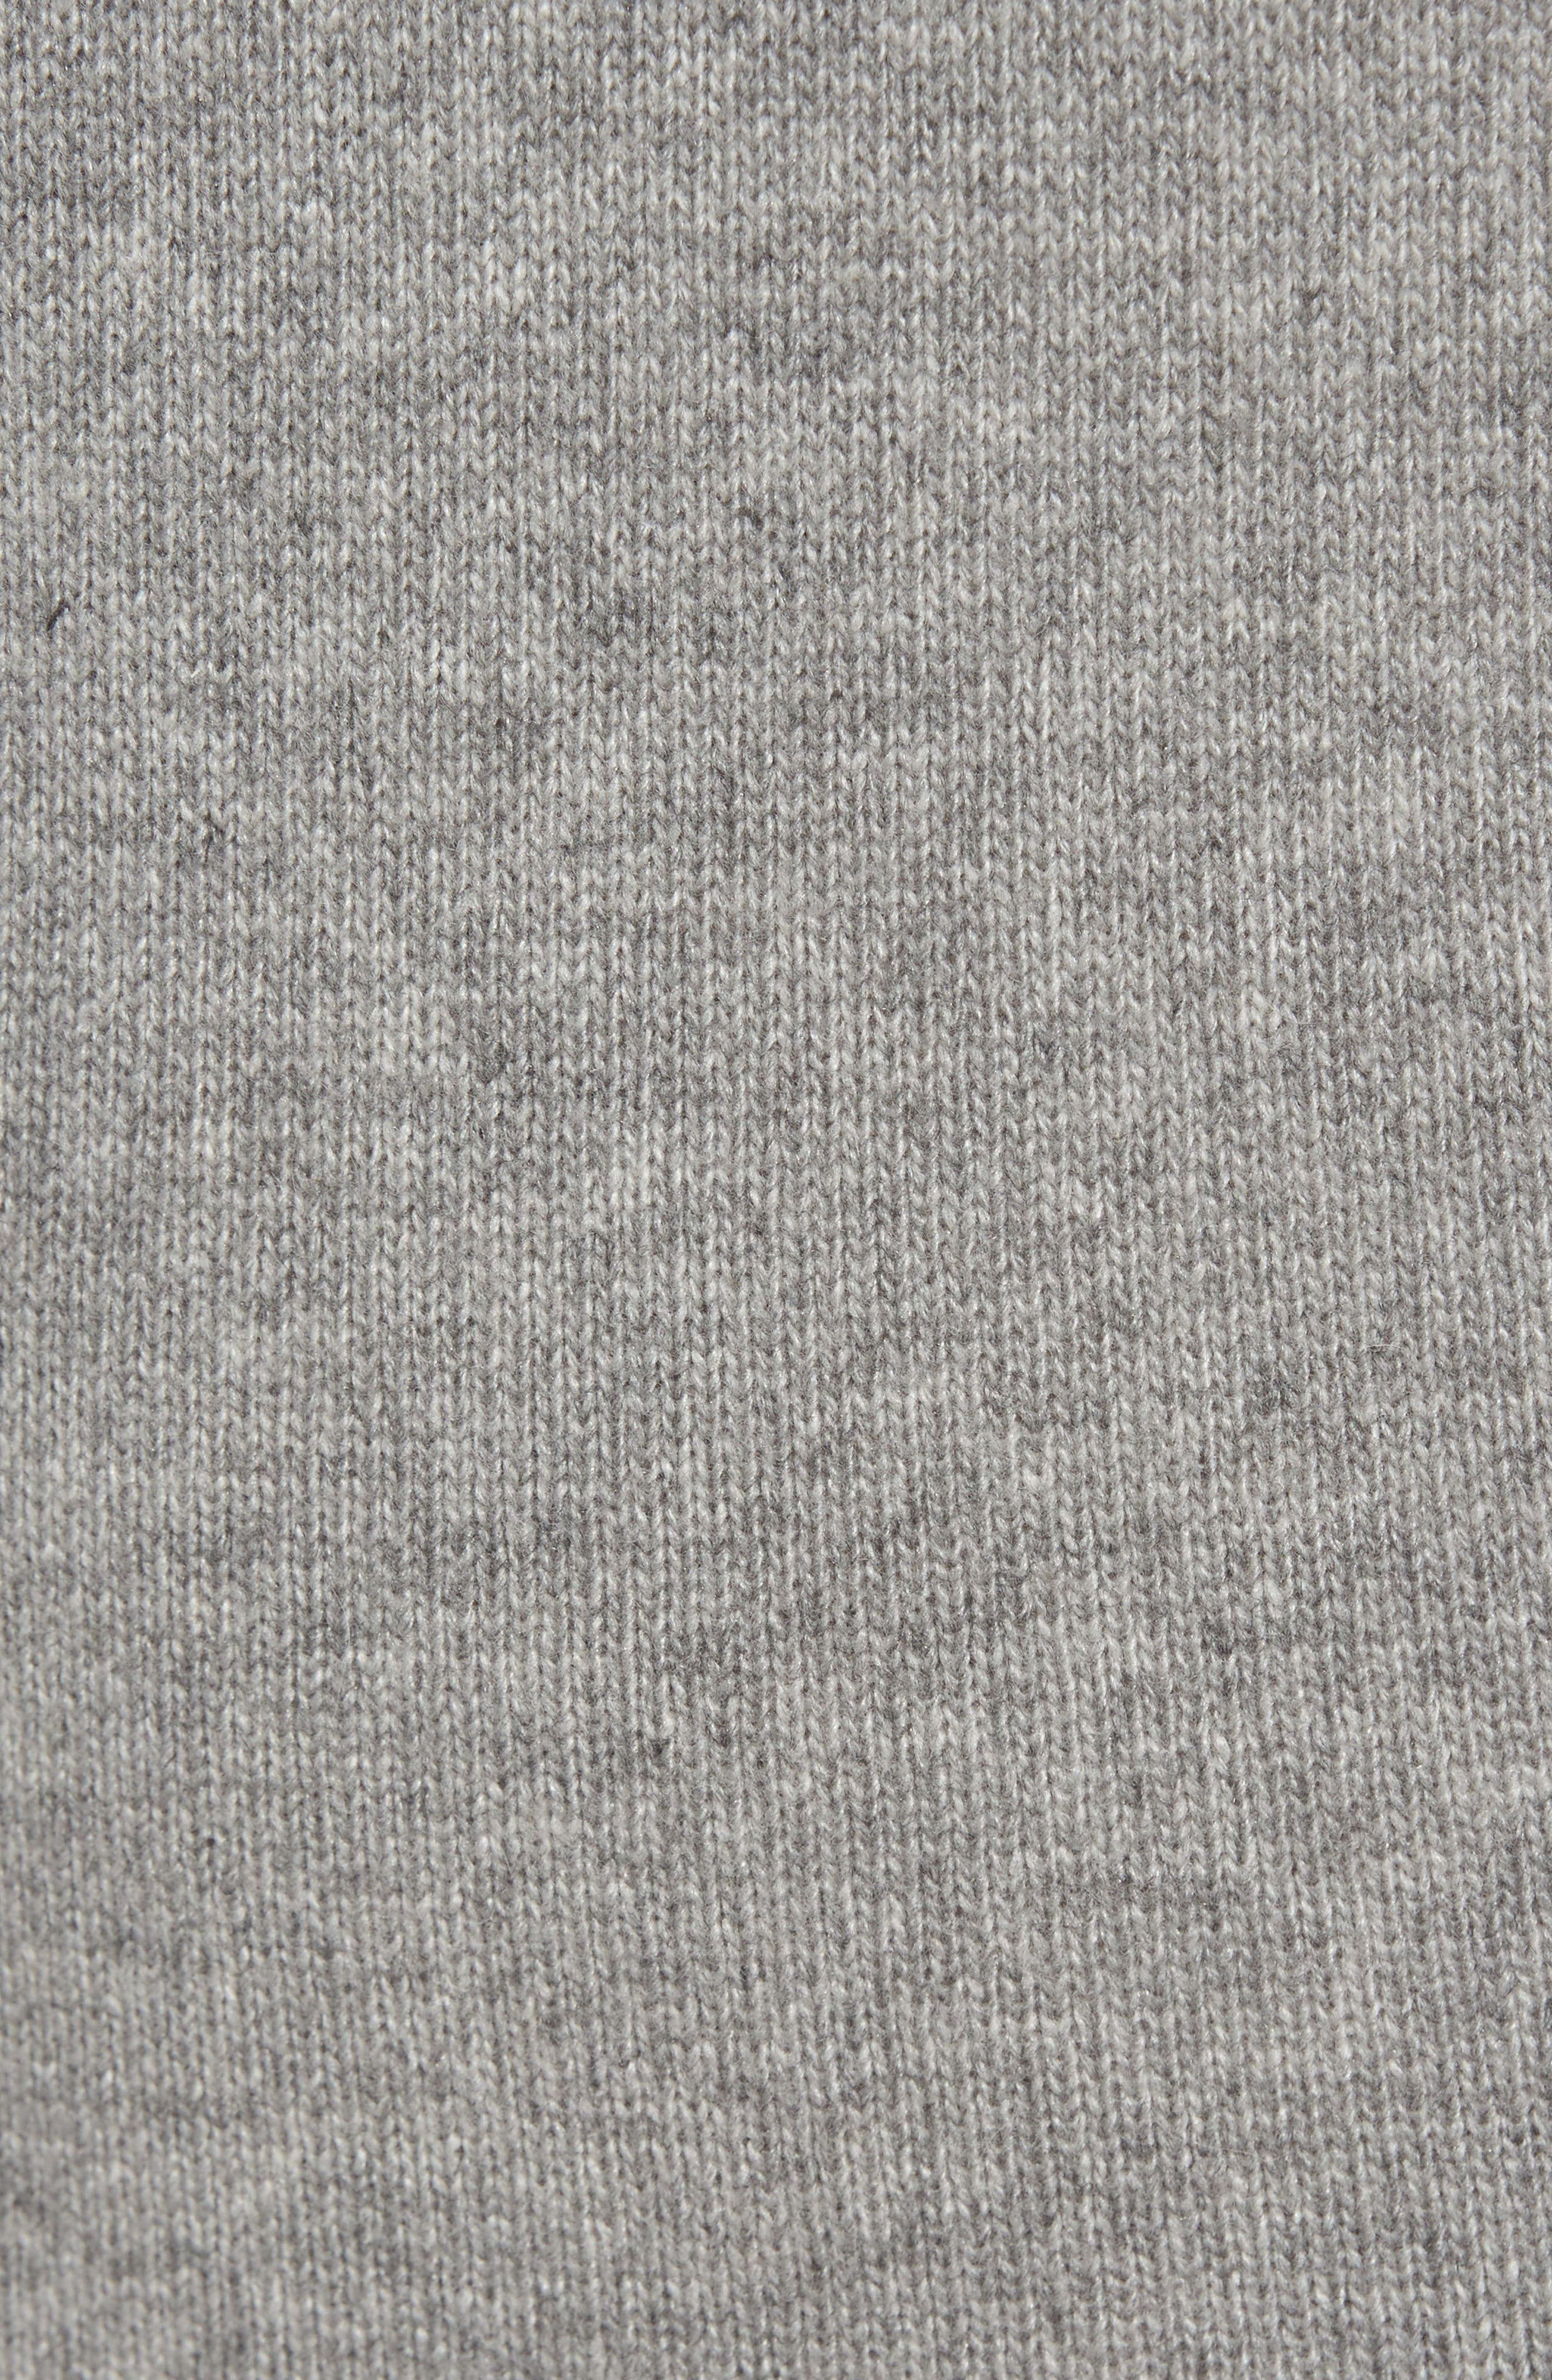 Destroyed Turtleneck Sweater Dress,                             Alternate thumbnail 5, color,                             Heather Grey